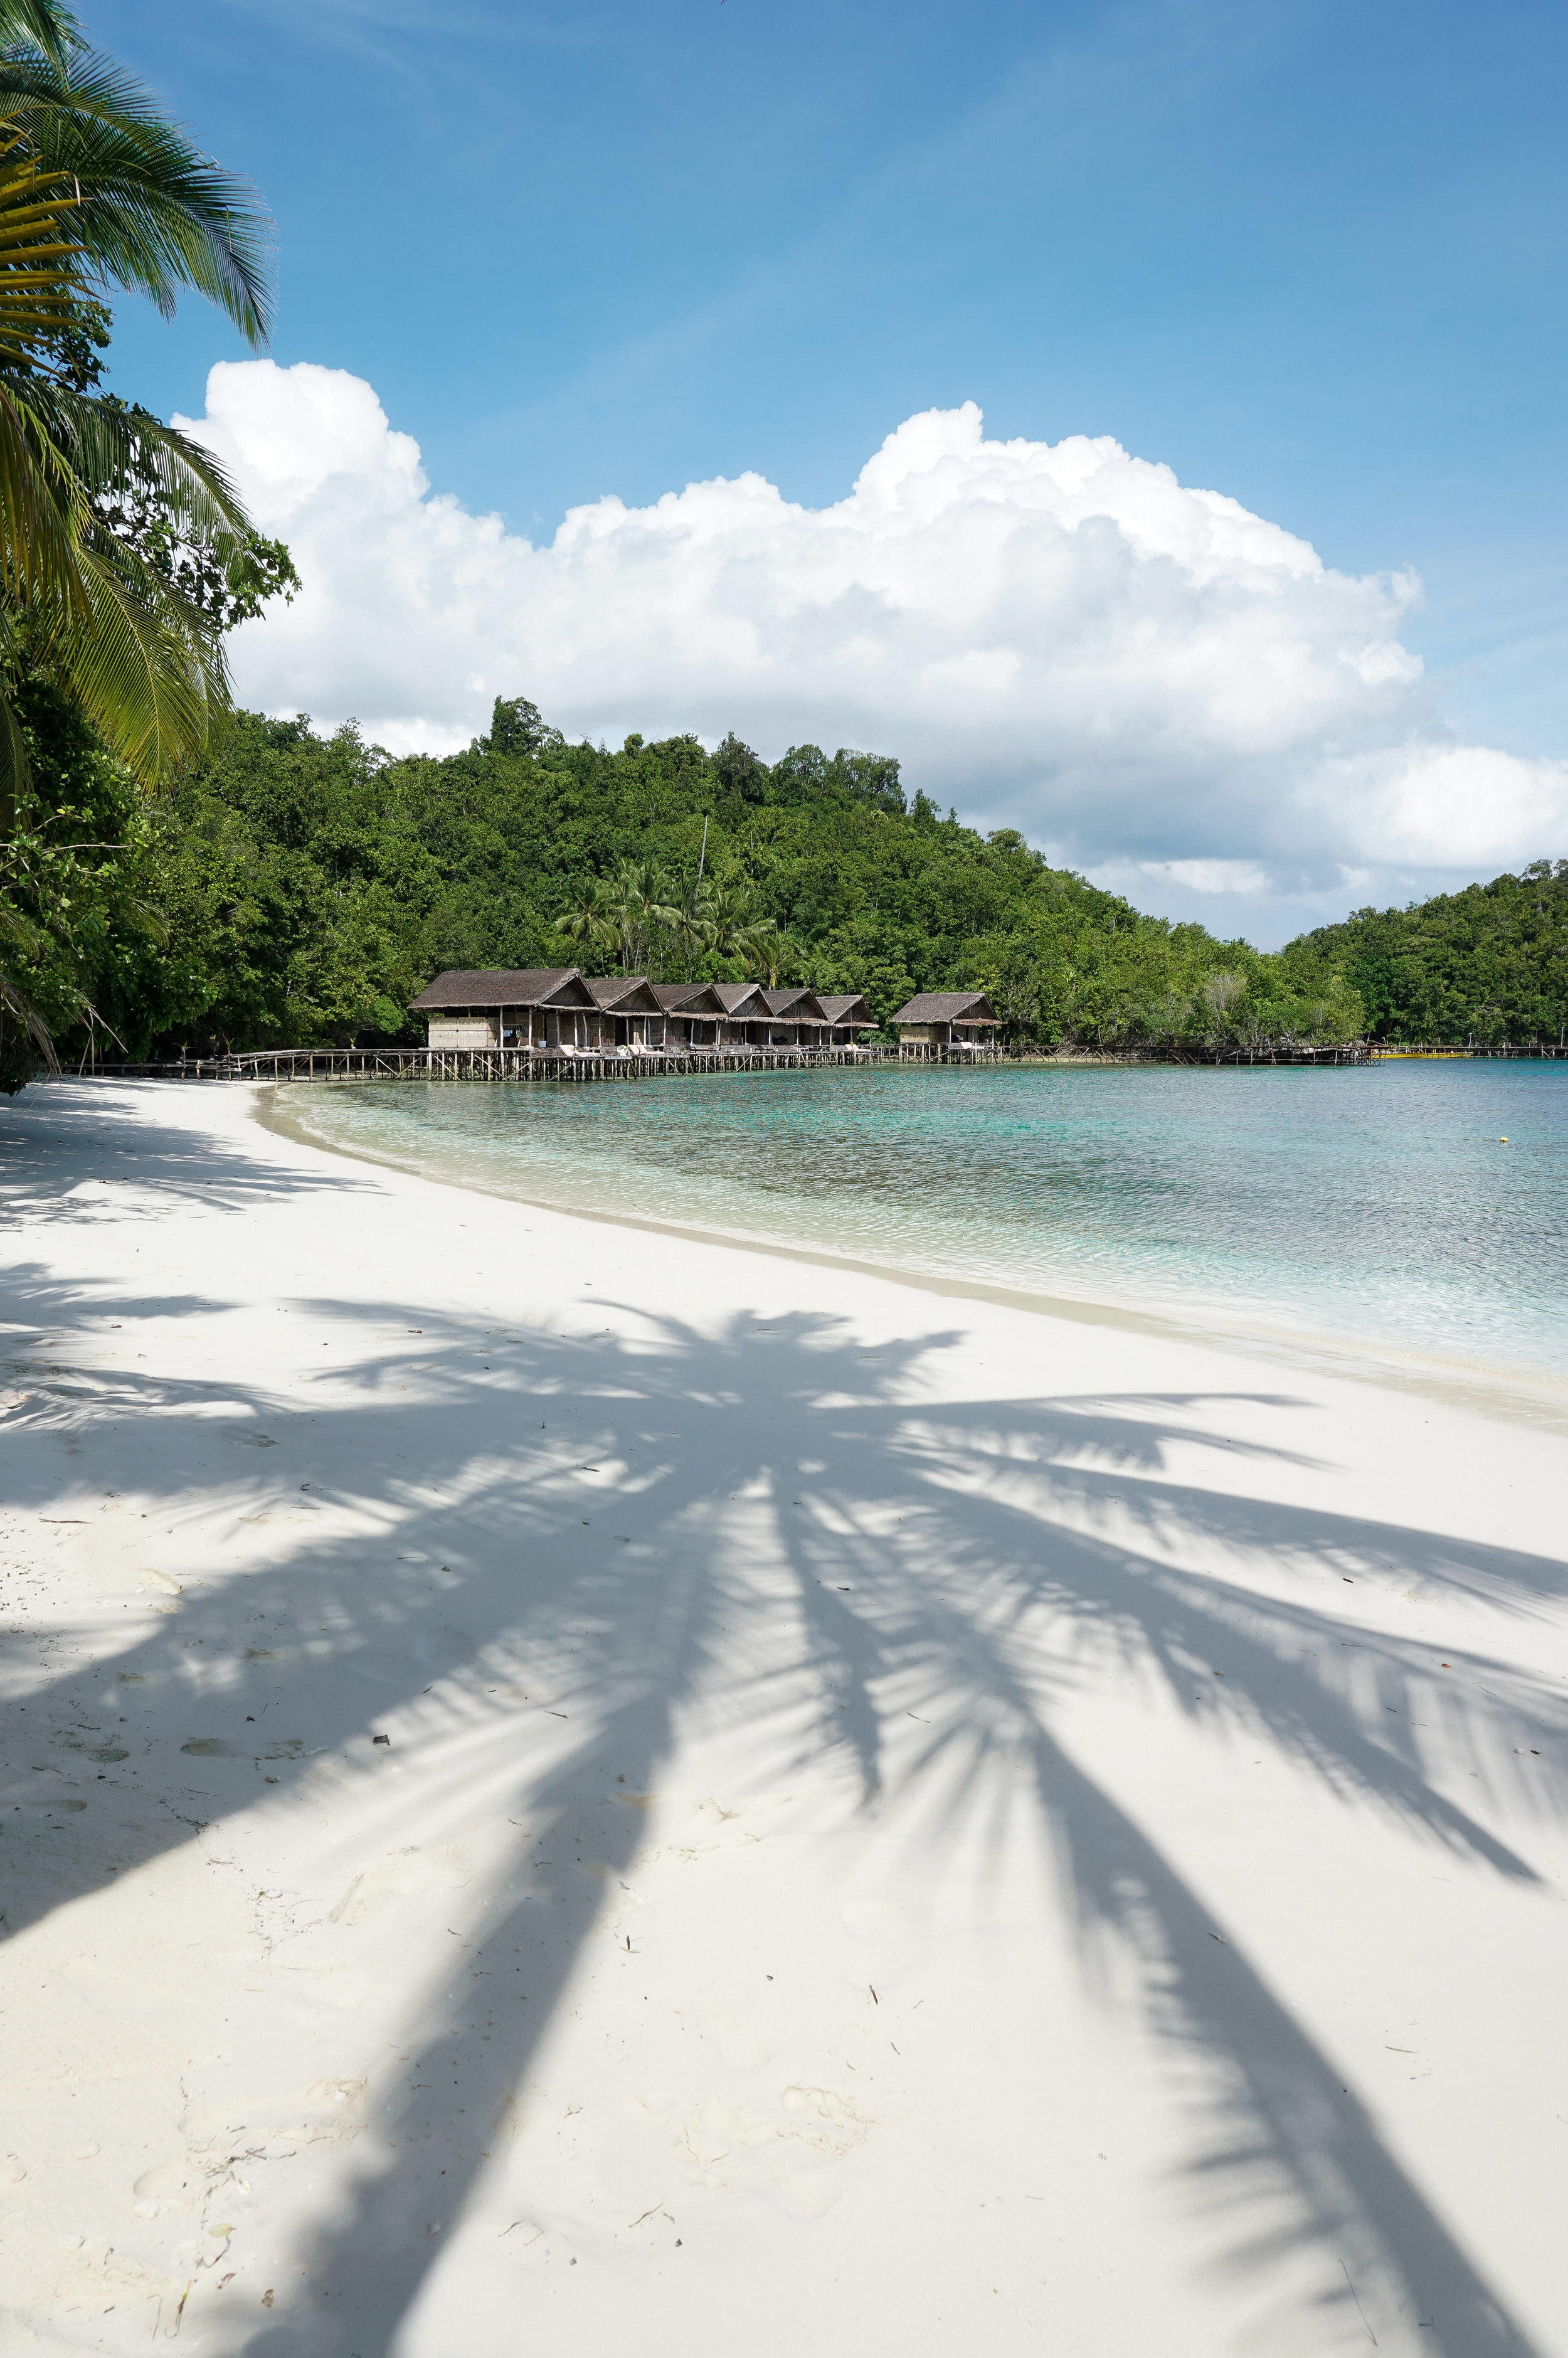 curio.trips.indonesia.raja.ampat.private.island.beach.palm.tree.shadow.portrait.jpg